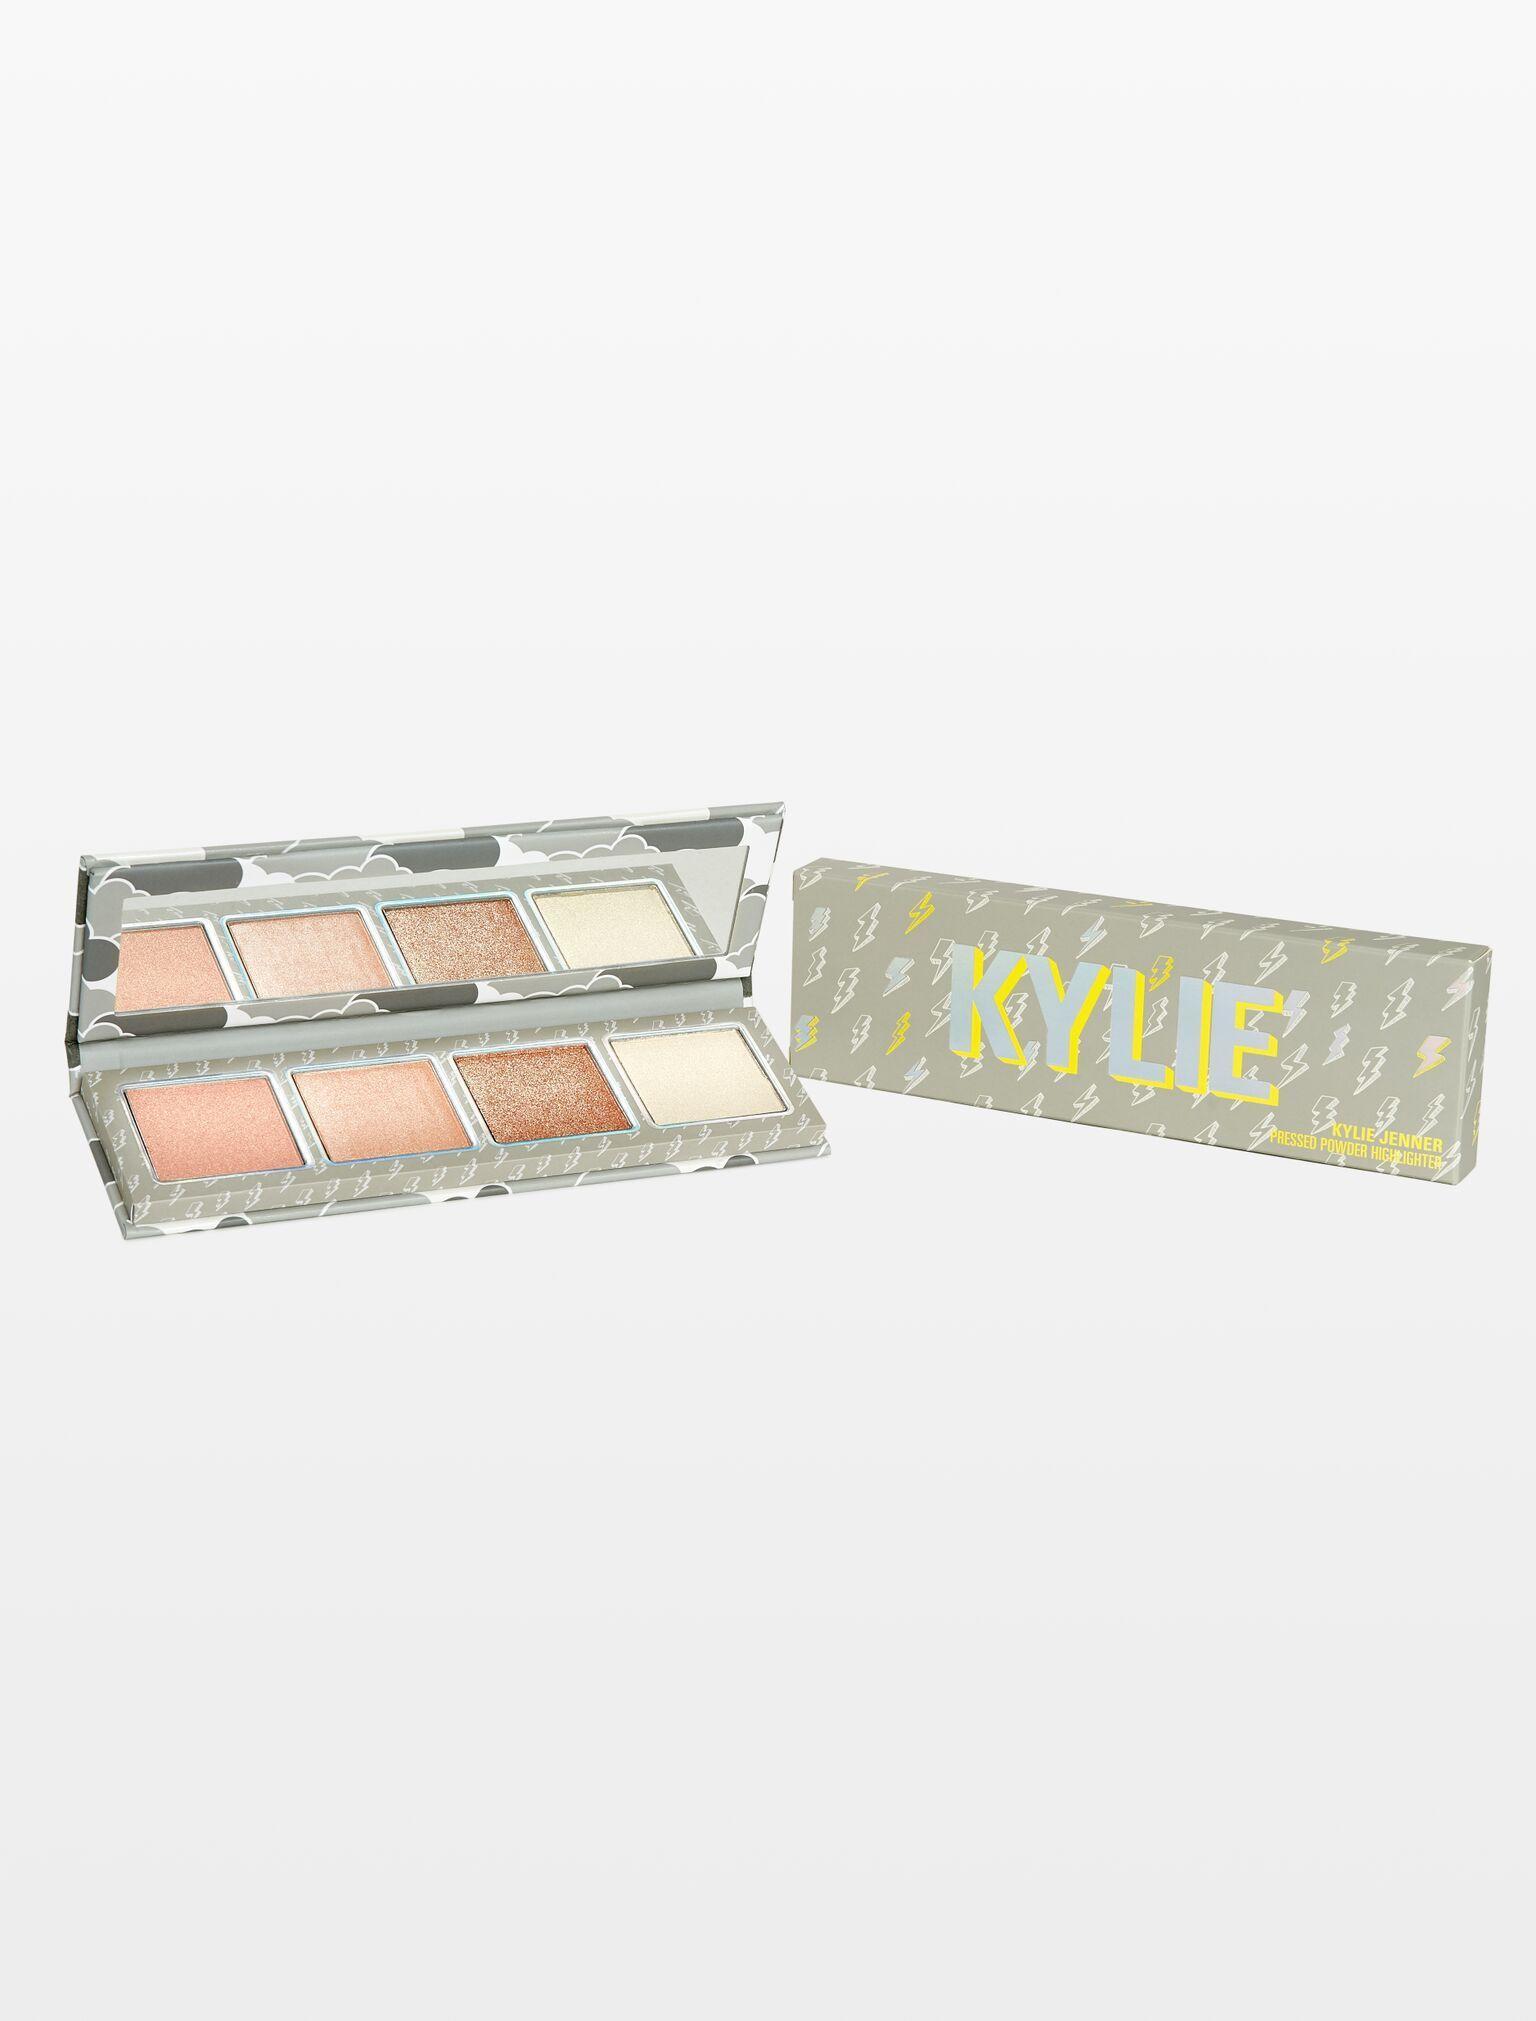 Kylie Jenner Pressed Powder Highlighter Palette